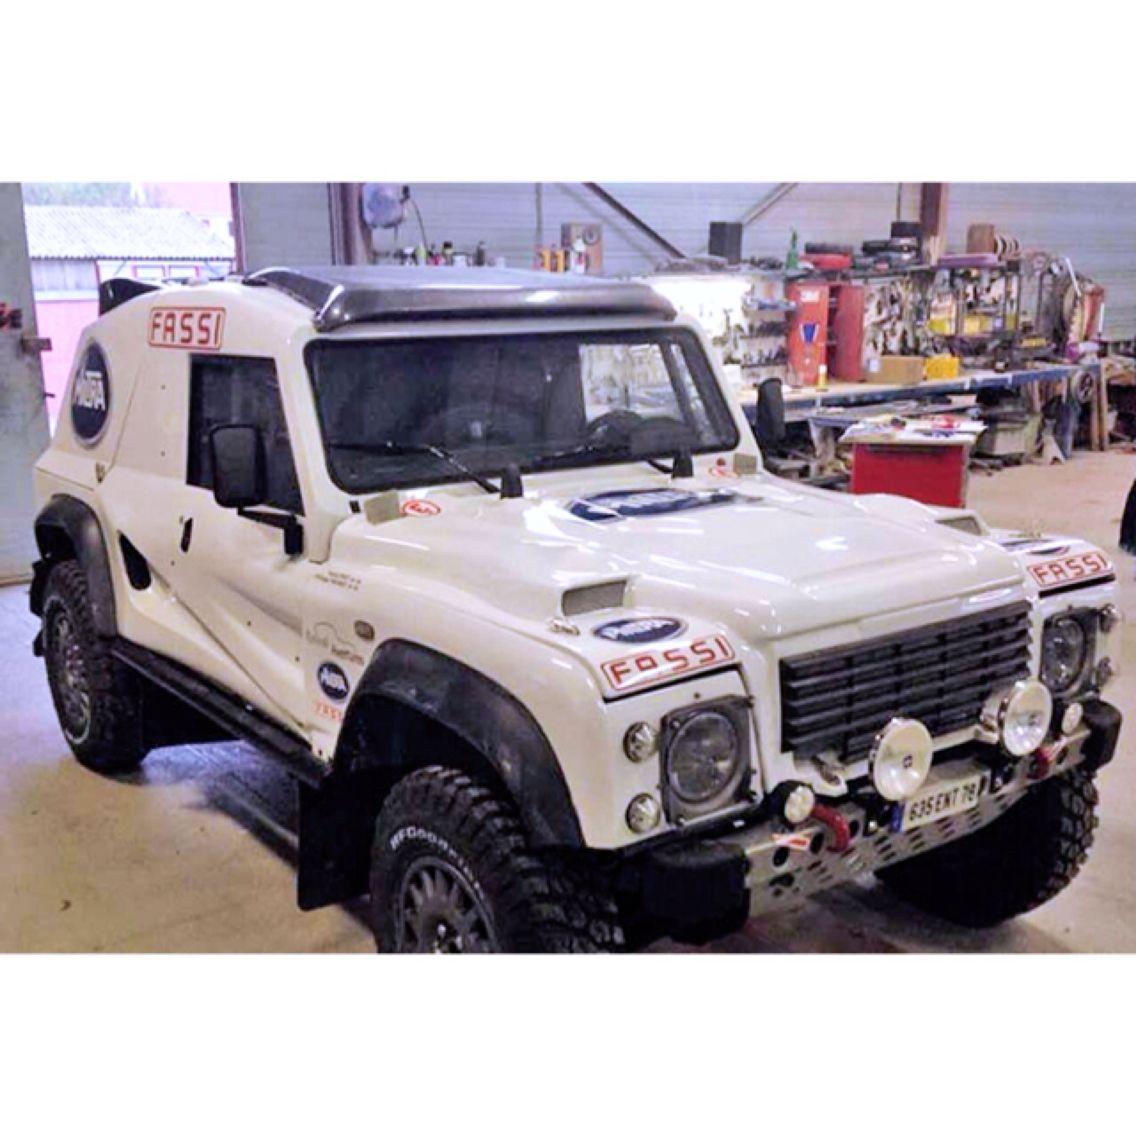 Land Rover Defender 90 Always At Dakar 2015 Edition